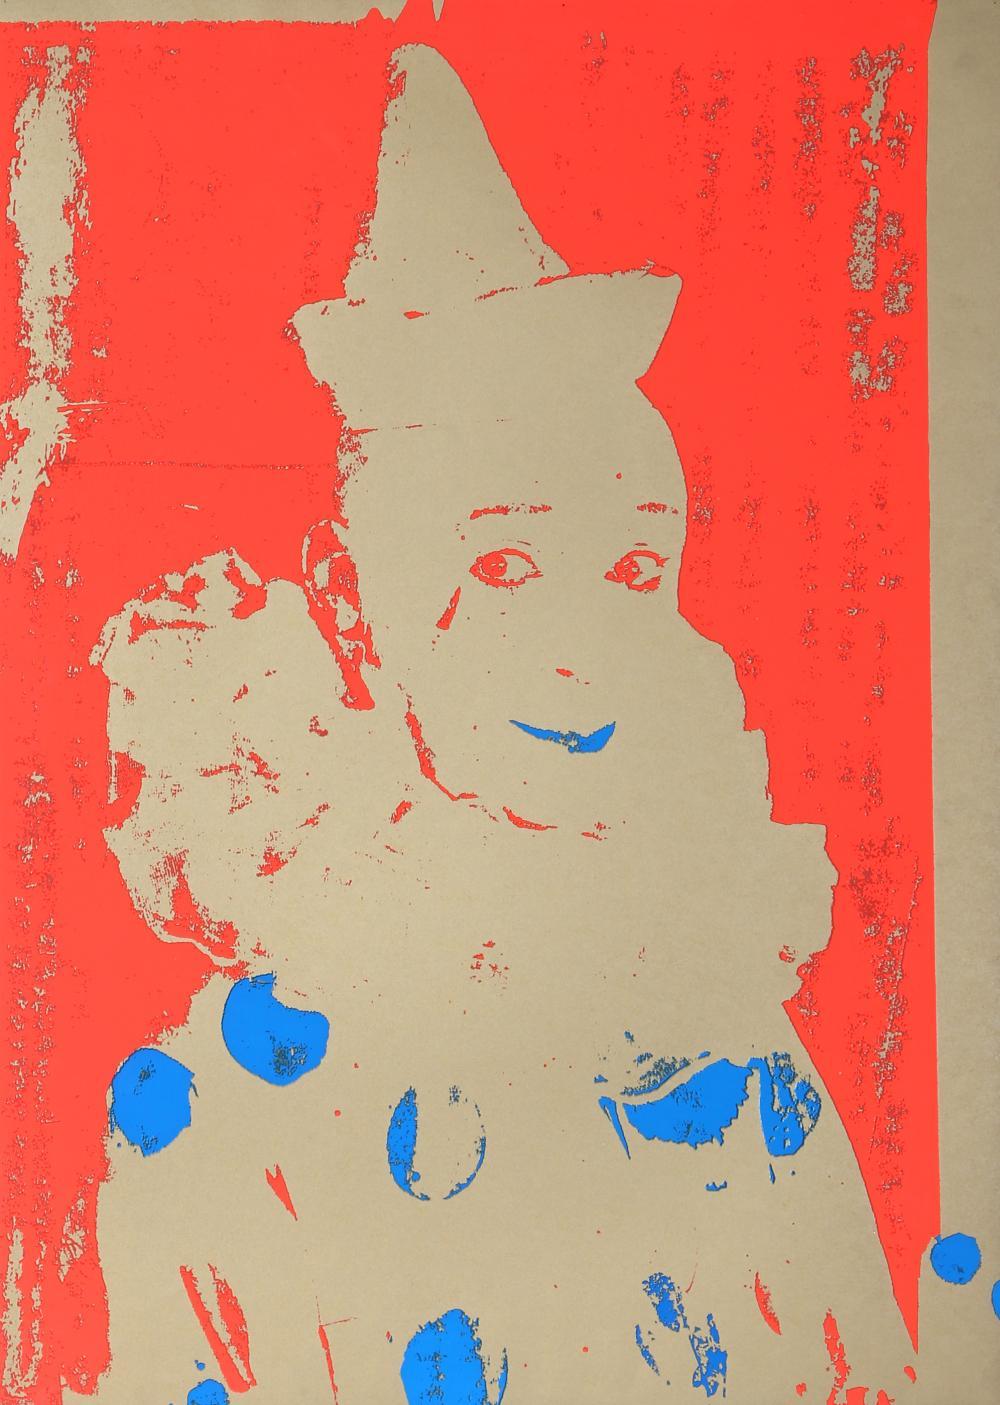 Ford Beckman, Neon Clown (Red with Blue), Silkscreen